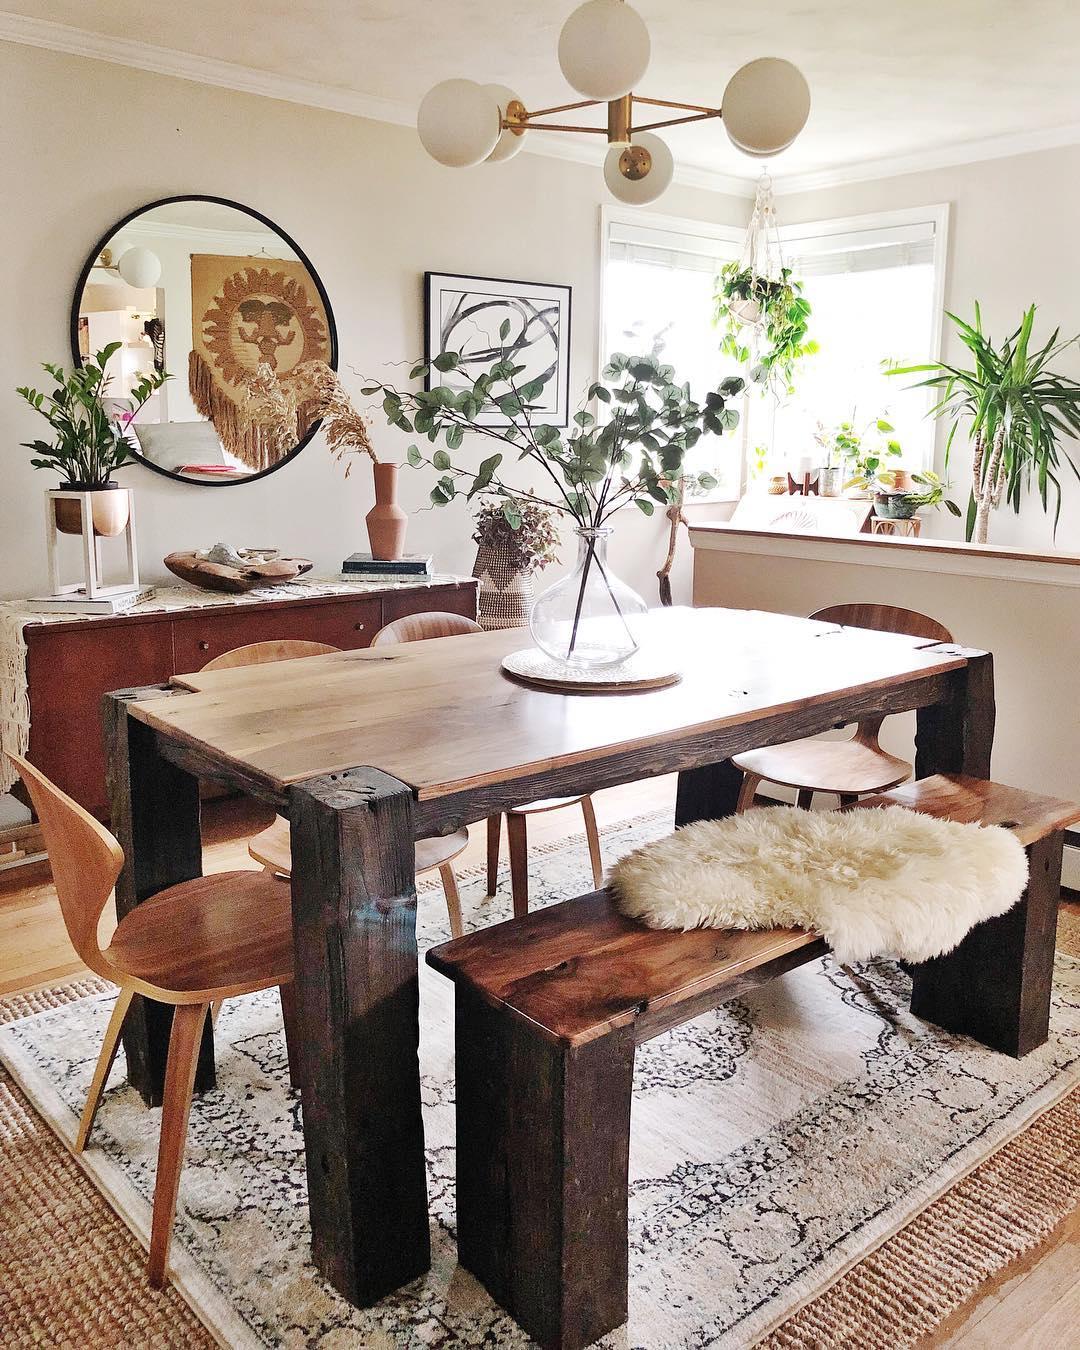 norman bentwood chair in 2019 influencer tags kitchen decor rh pinterest com